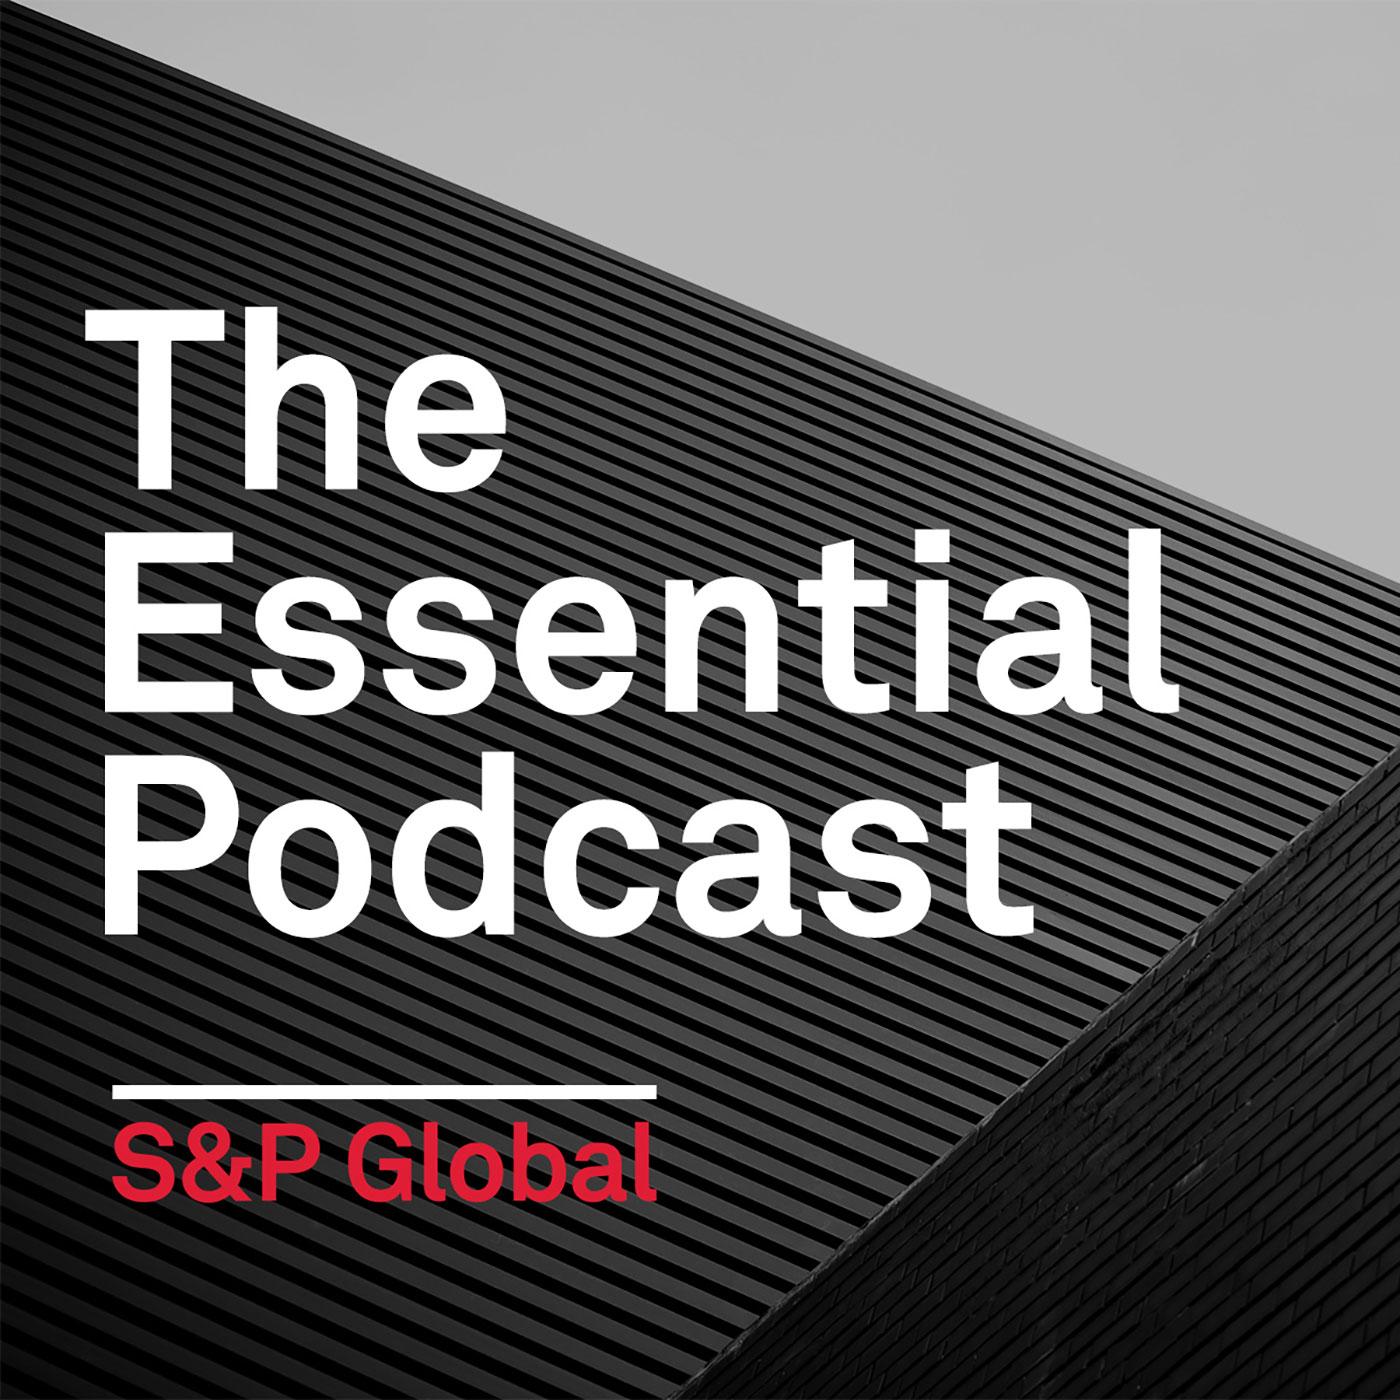 The Essential Podcast show art